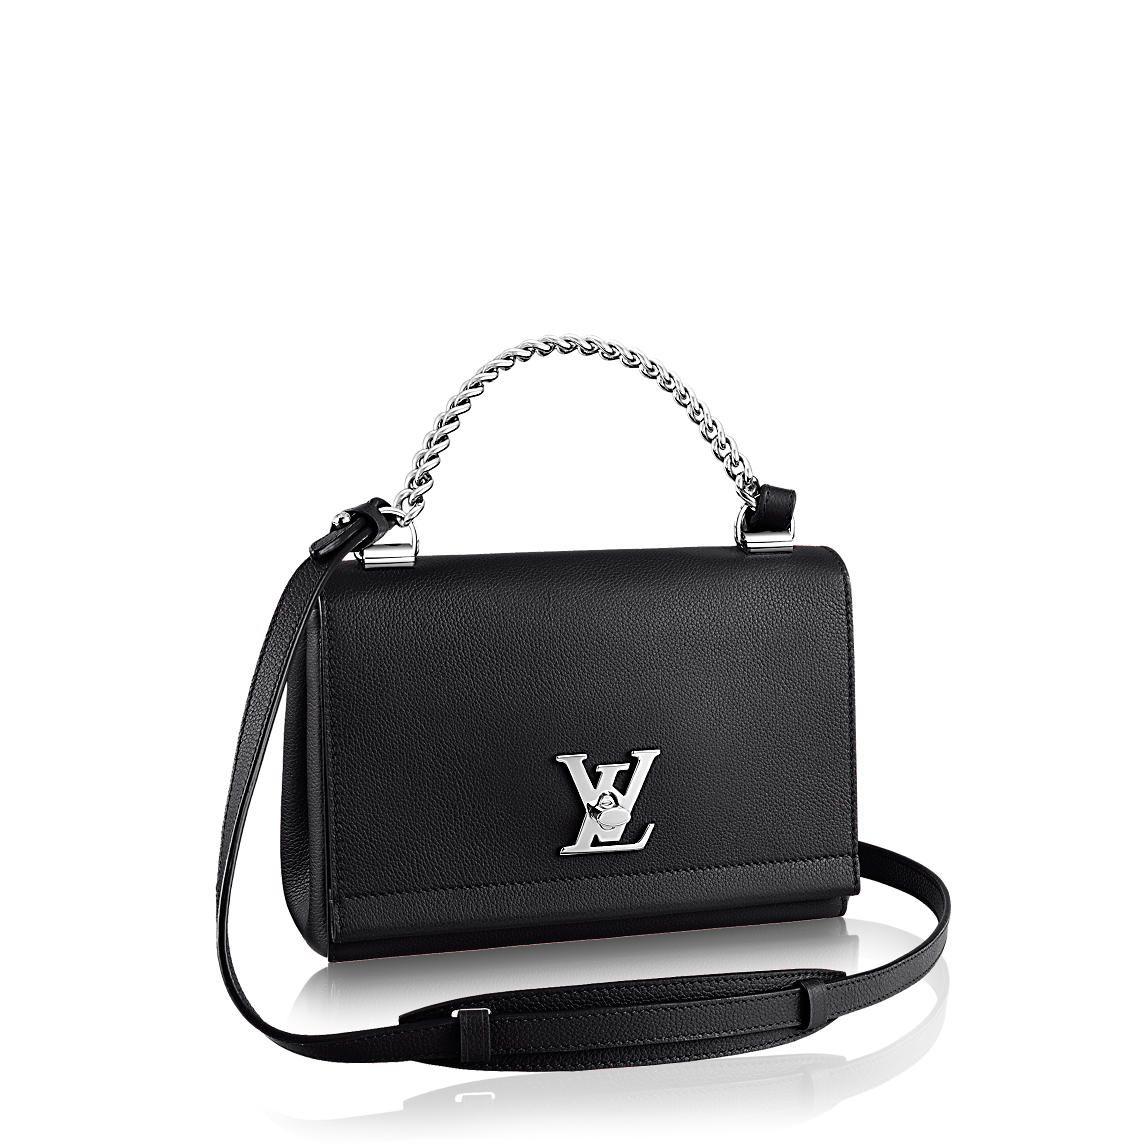 4b8b0b2b92bb Louis Vuitton Lockme II BB black and silver chain handle mini bag ...